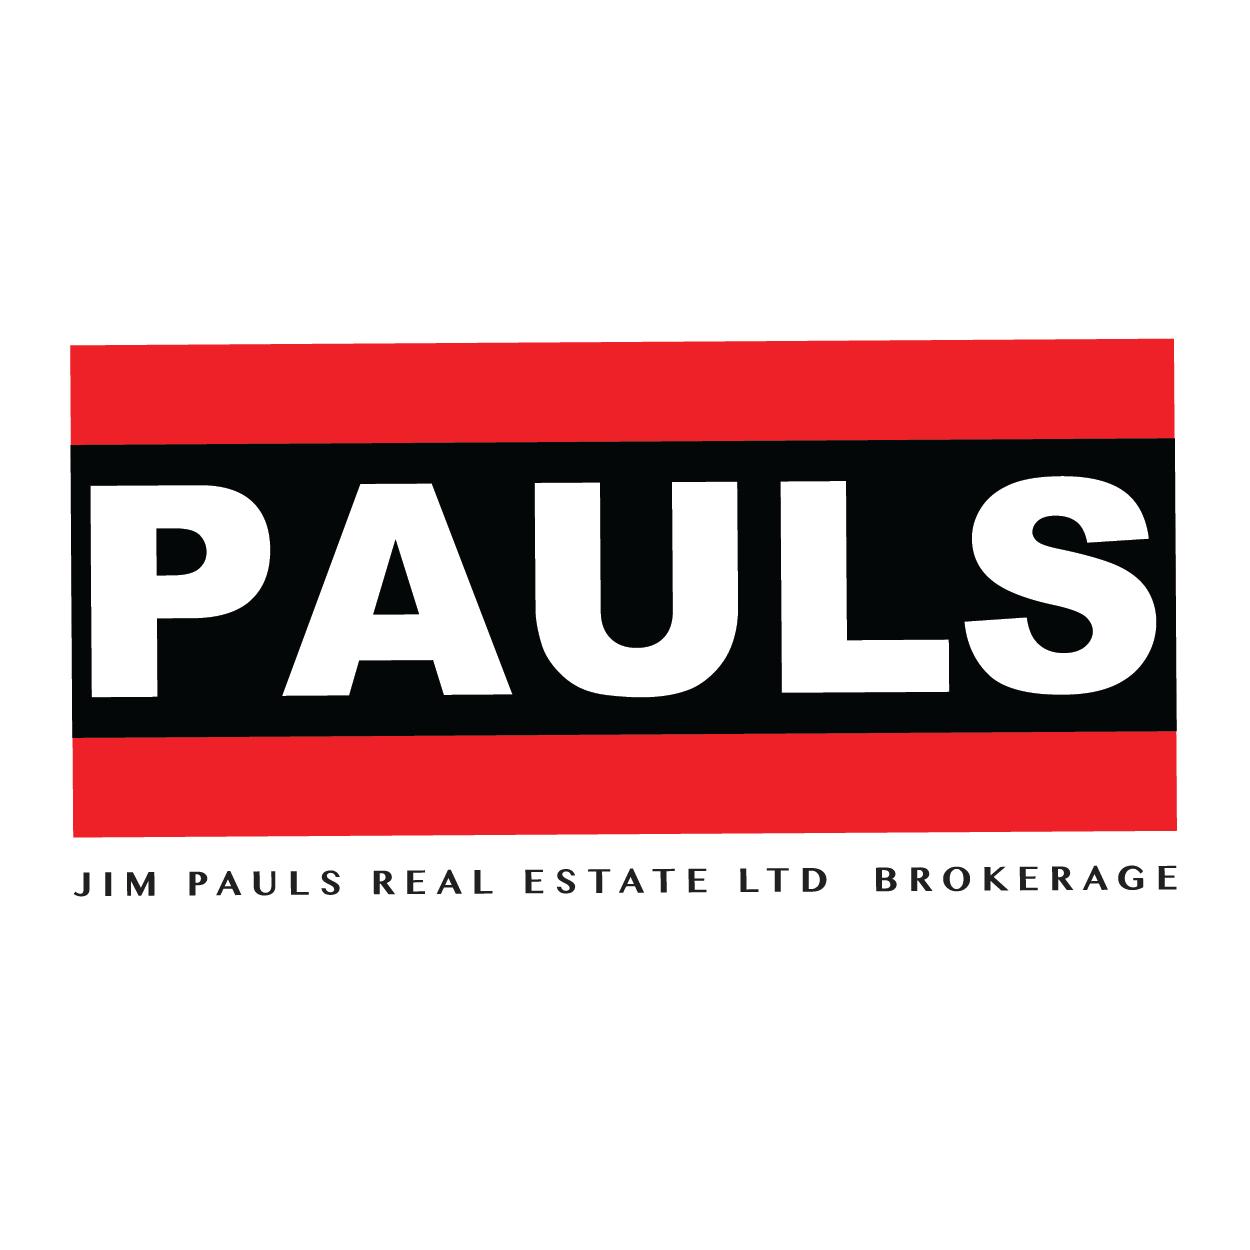 Pauls-01.png